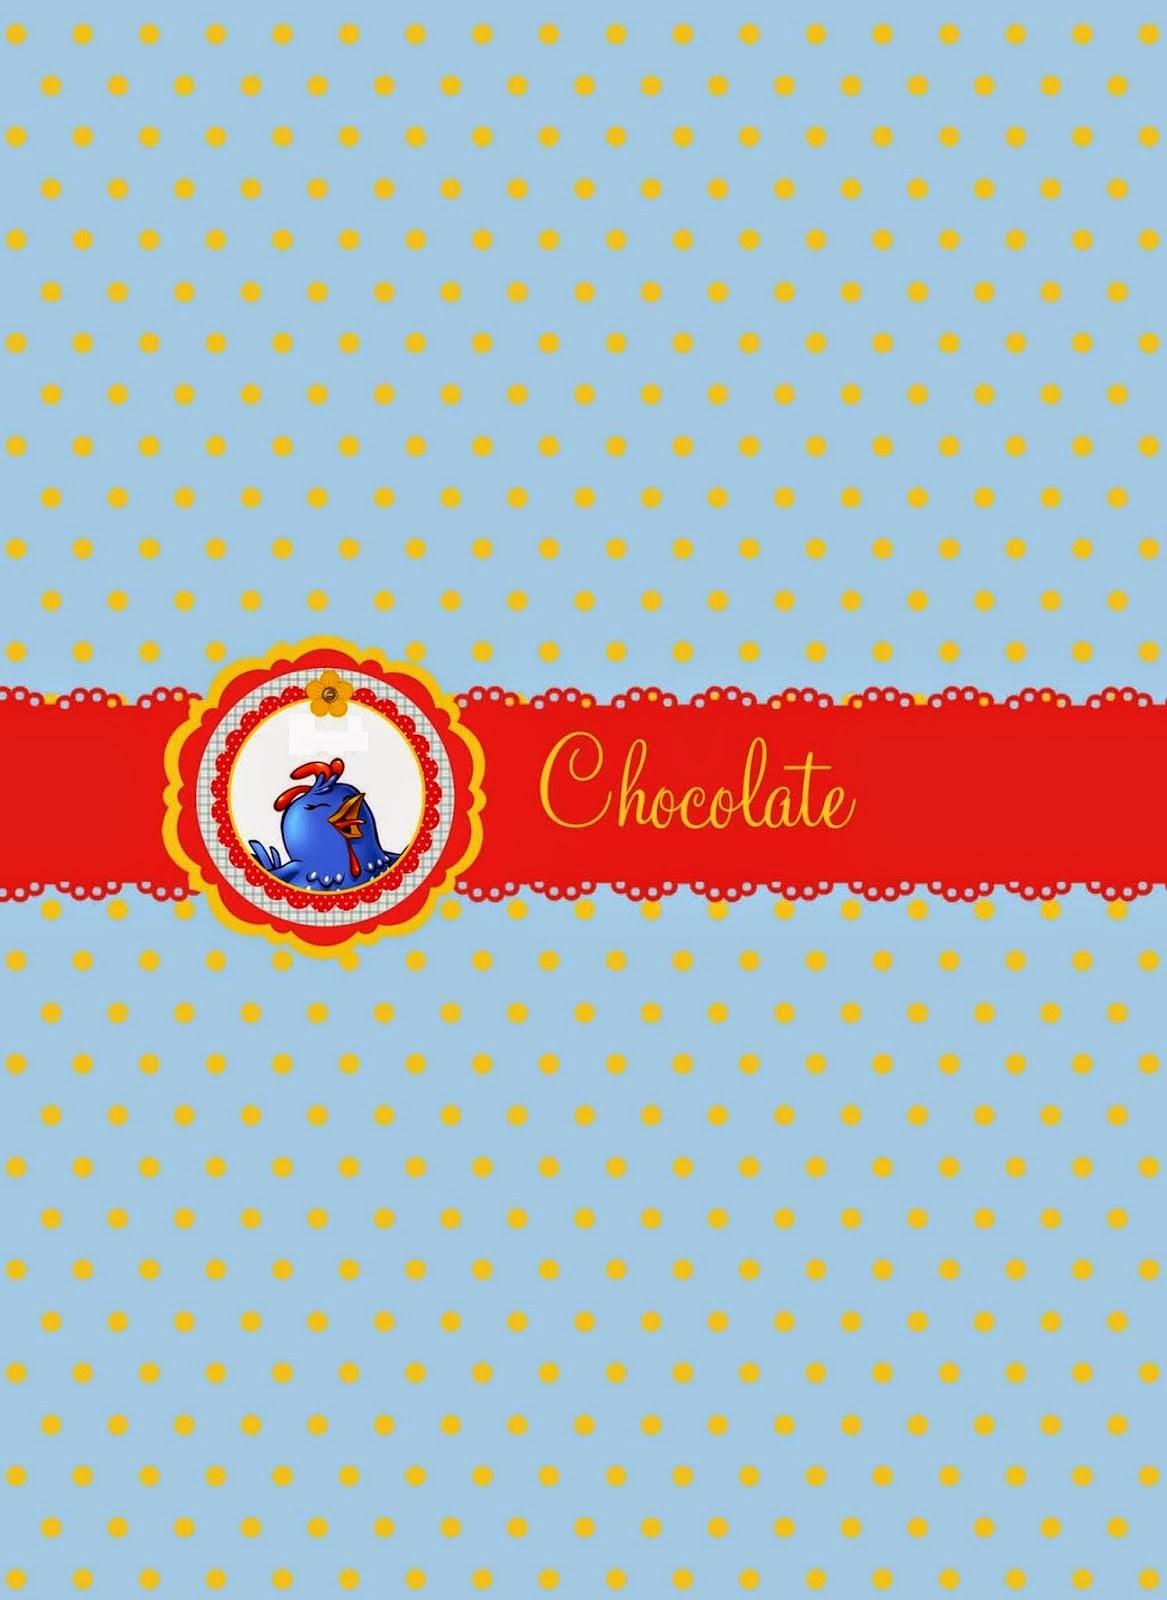 Lottie Dottie Chicken: Free Party Printables